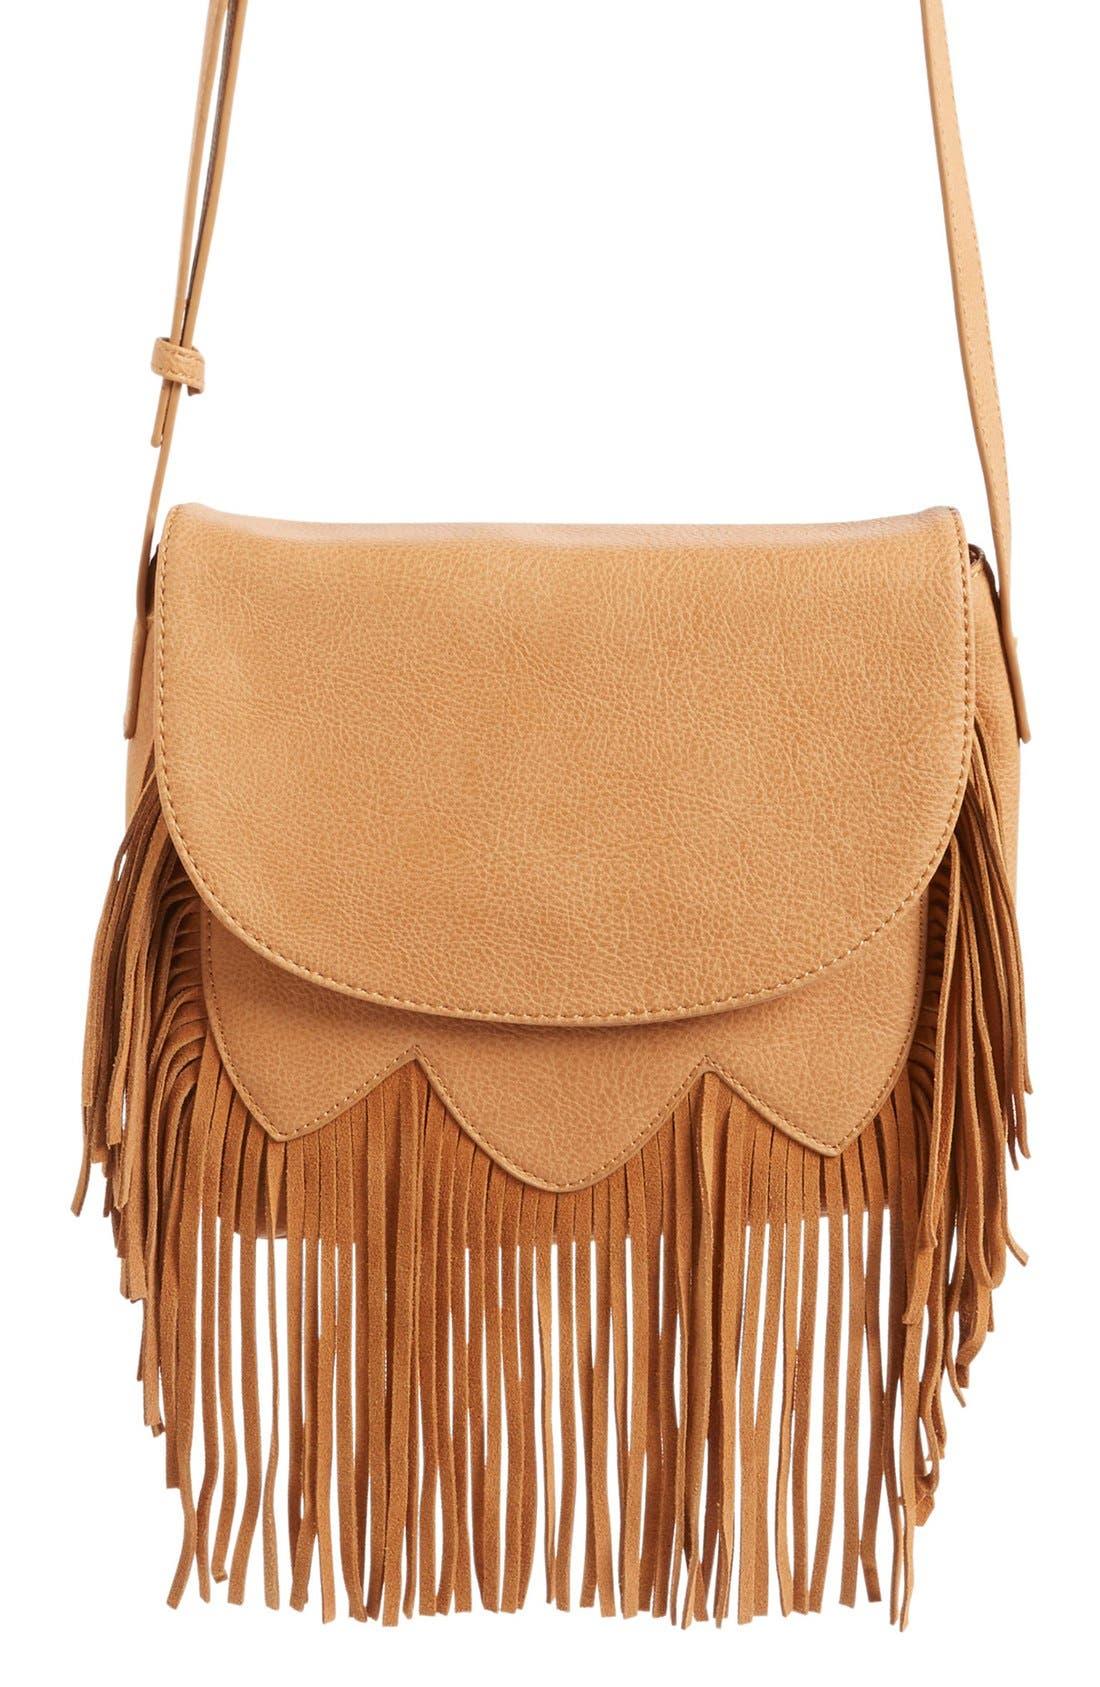 Main Image - Sole Society 'Kerry' Fringe Faux Leather Crossbody Bag